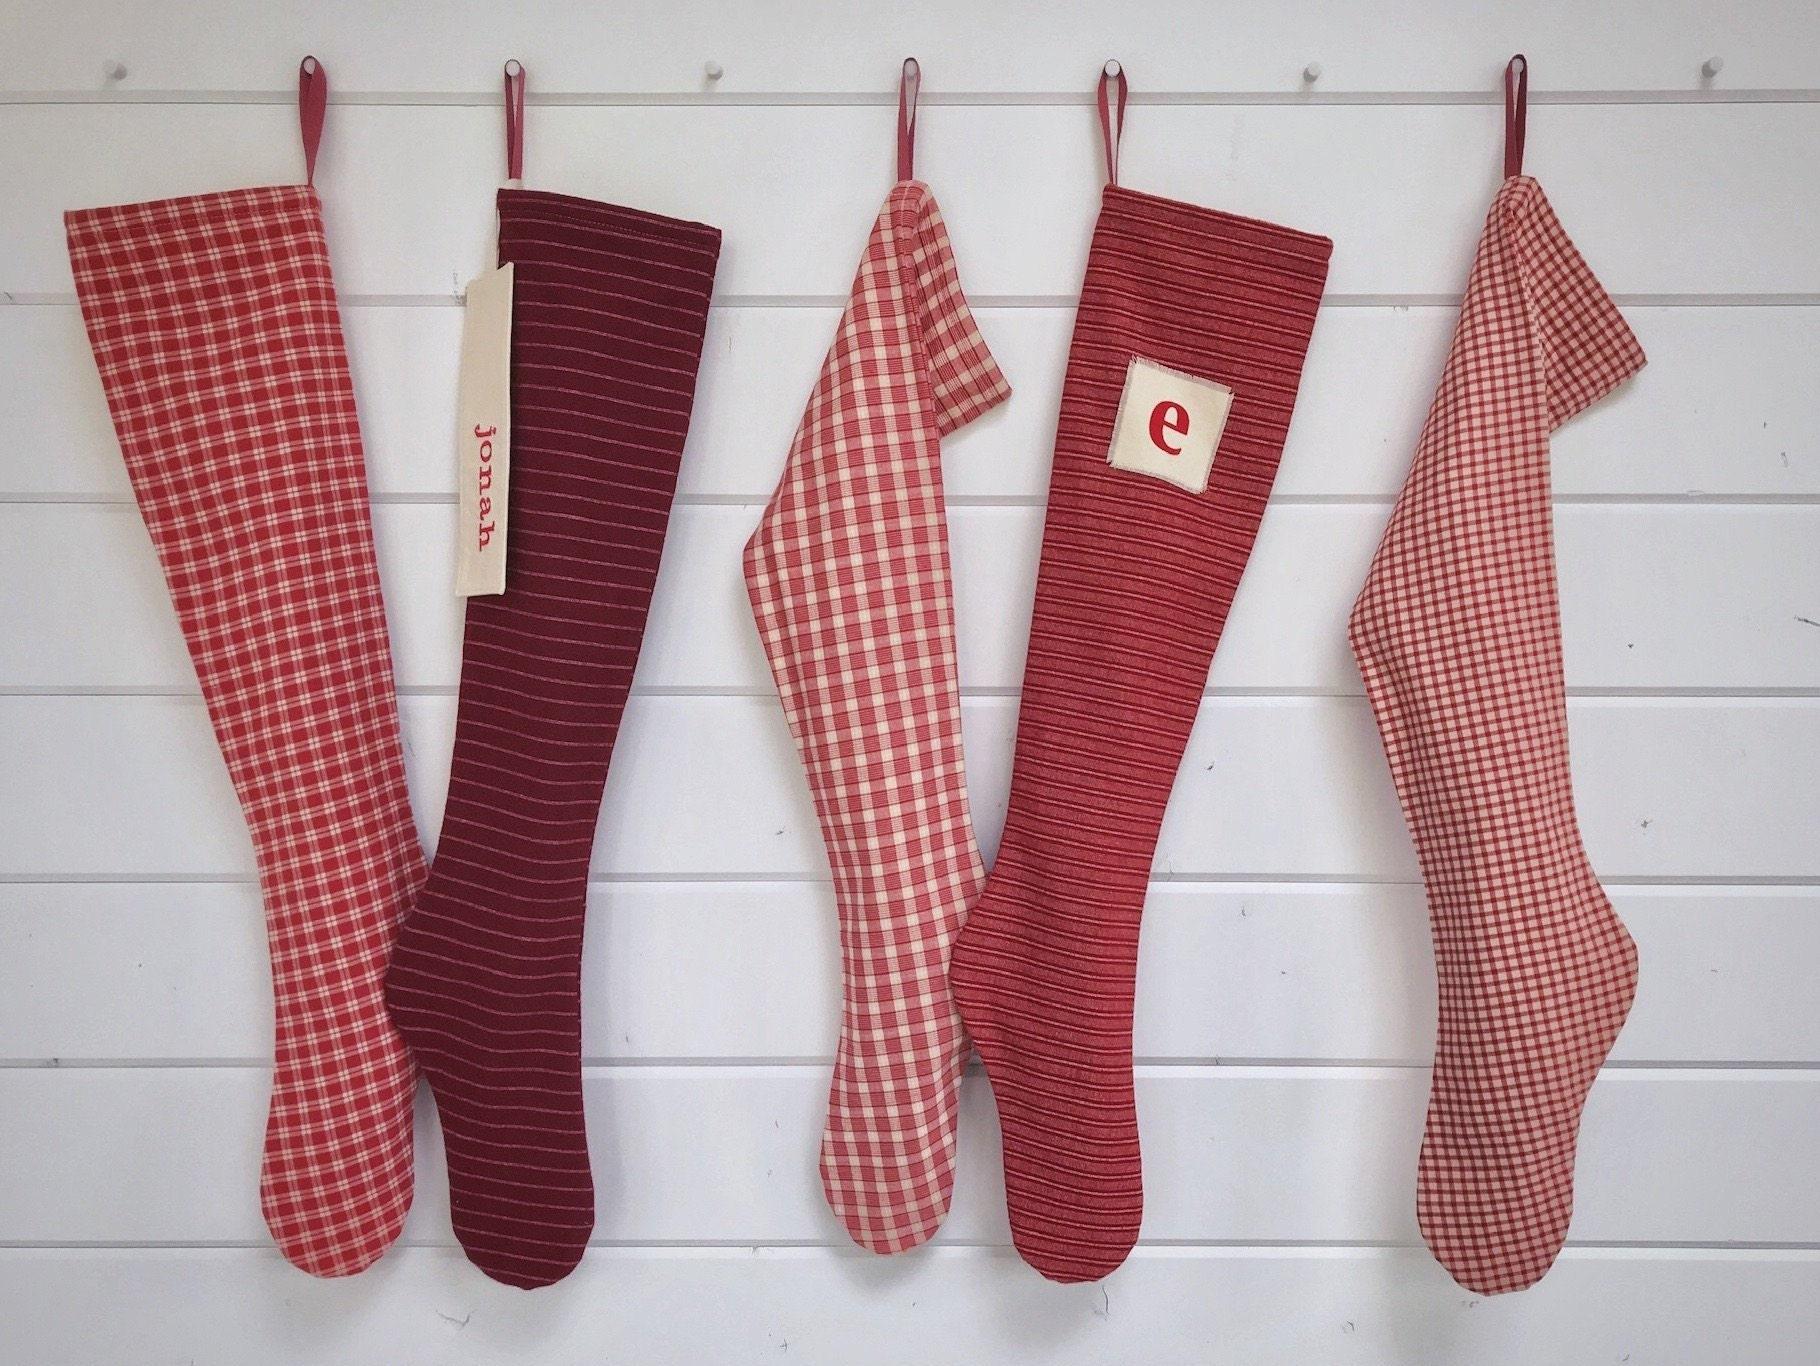 Nordic Lodge Personalised Stocking On Fireplace Mantel Holiday